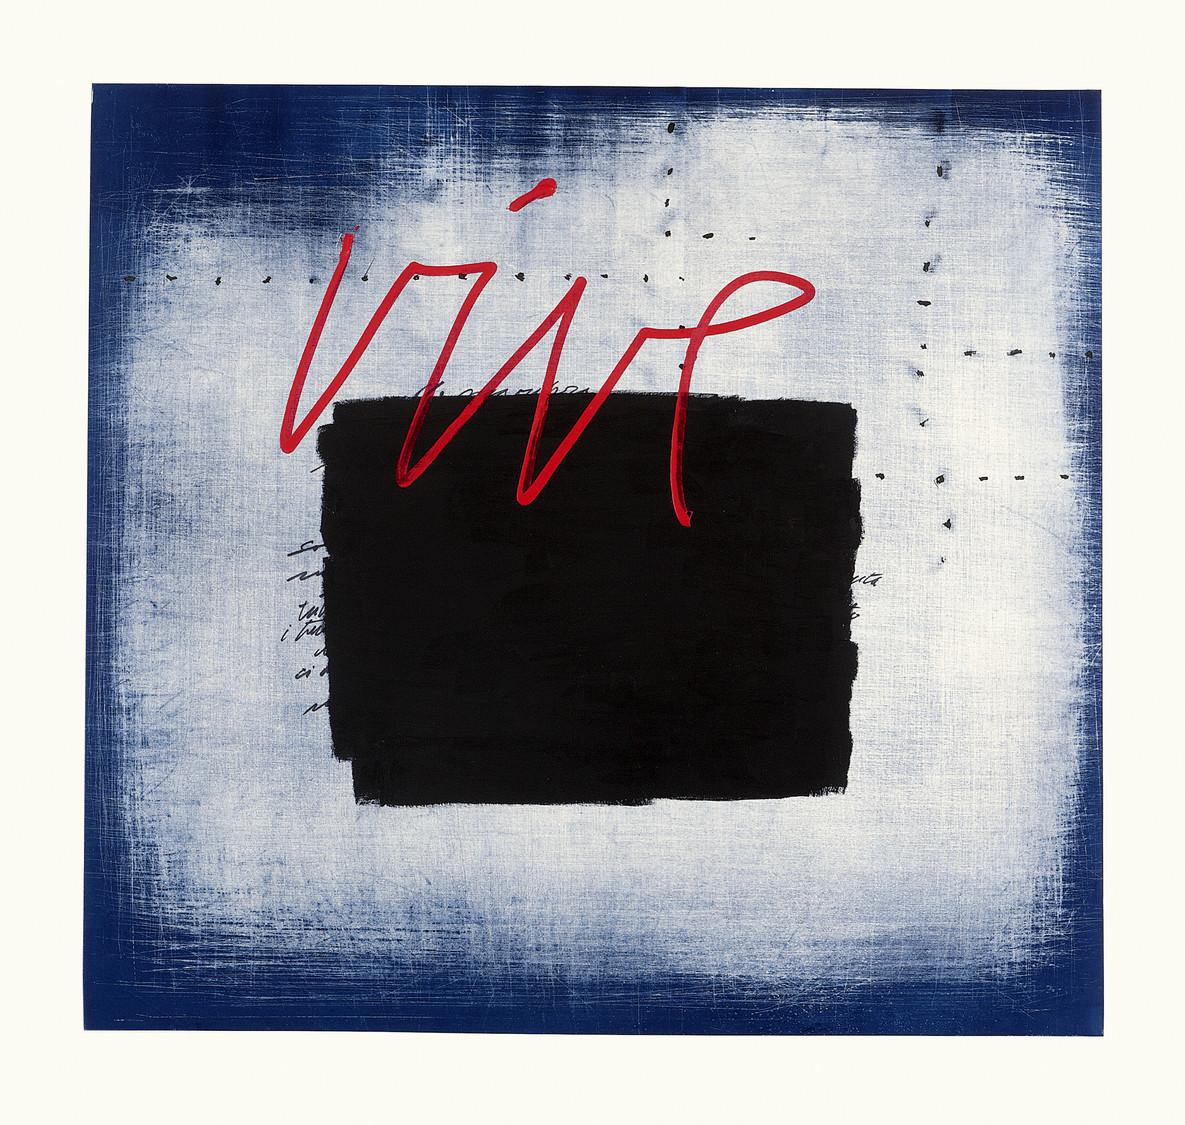 VIVE  - 110 x 115 cm